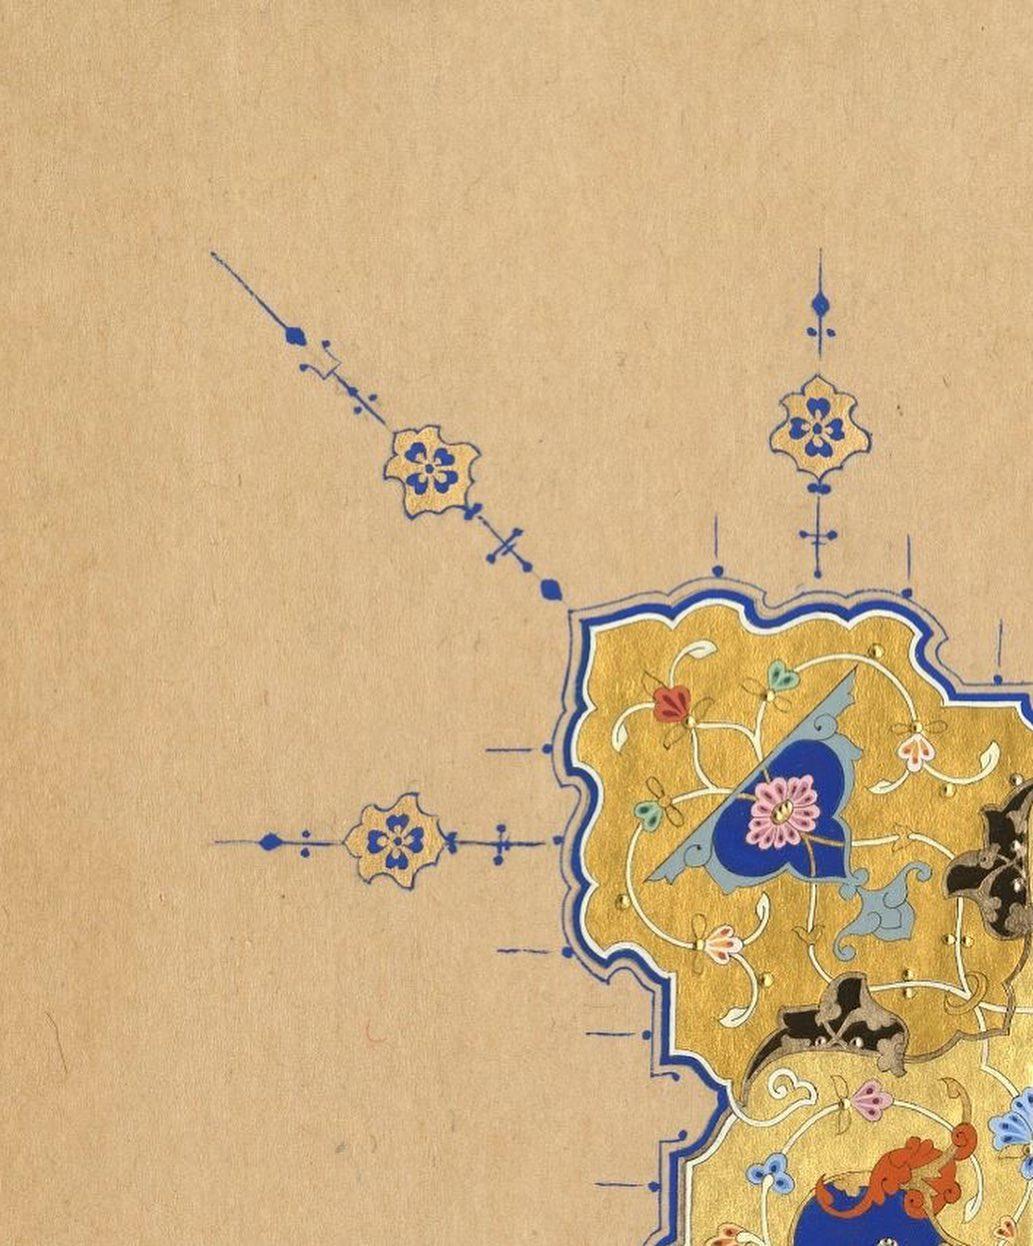 Apk Website For Arabic Calligraphy بِسْمِ اللّٰهِ الرَّحْمٰنِ الرَّح۪يمِ اَلْحَمْدُ لِلّٰهِ رَبِّ الْـعَالَم۪ينَۙ ا... 1441 6